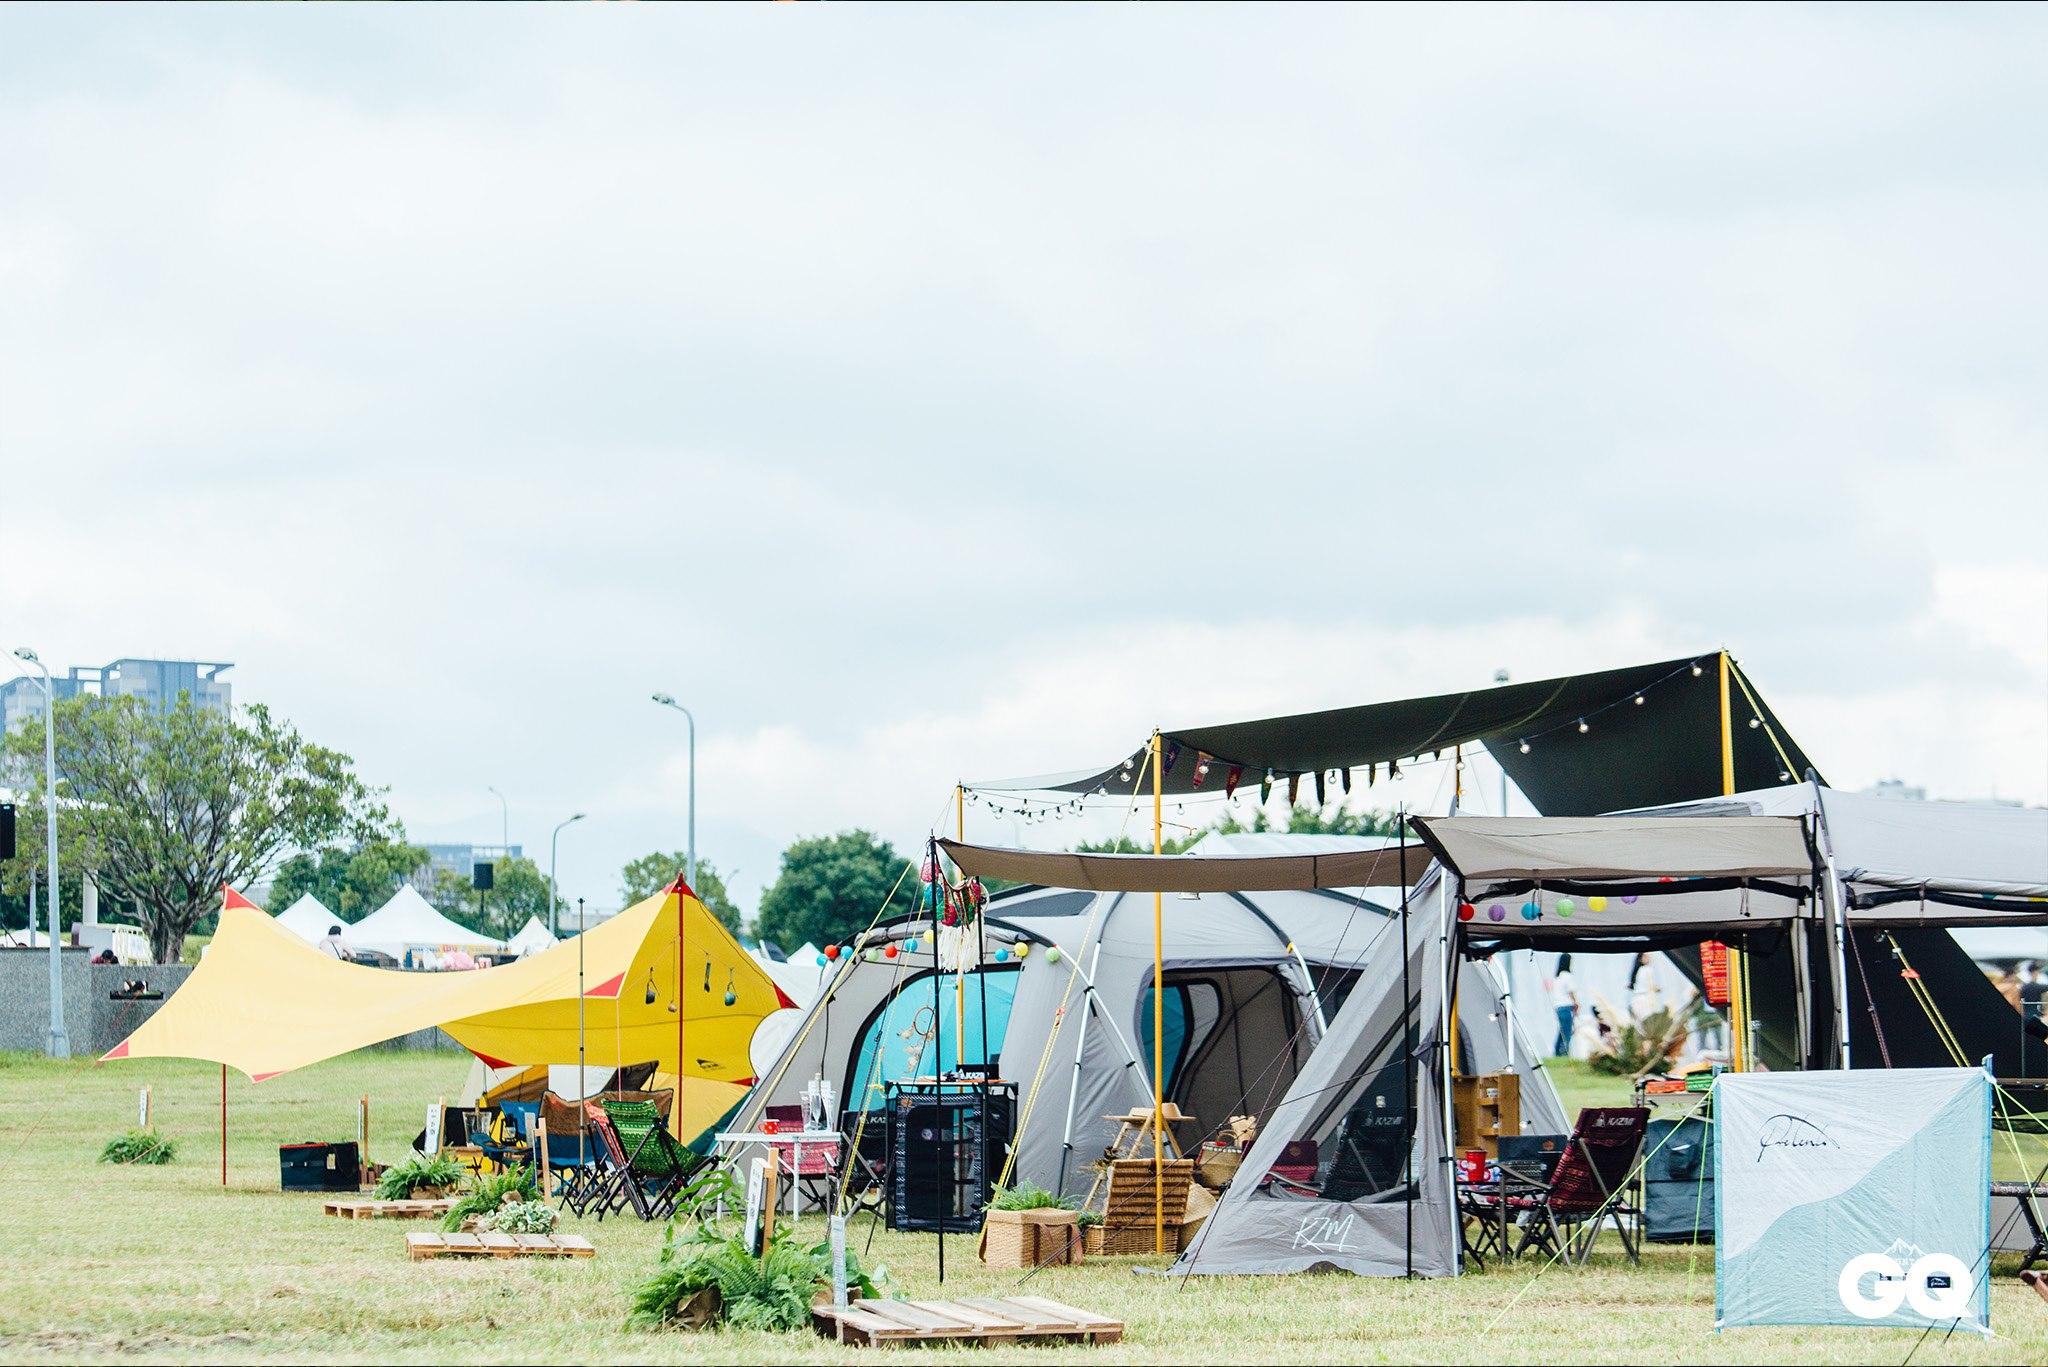 gq,野營,城市野營嘉年華,2019野營,露營活動2019,露營,風格露營,裝備市集